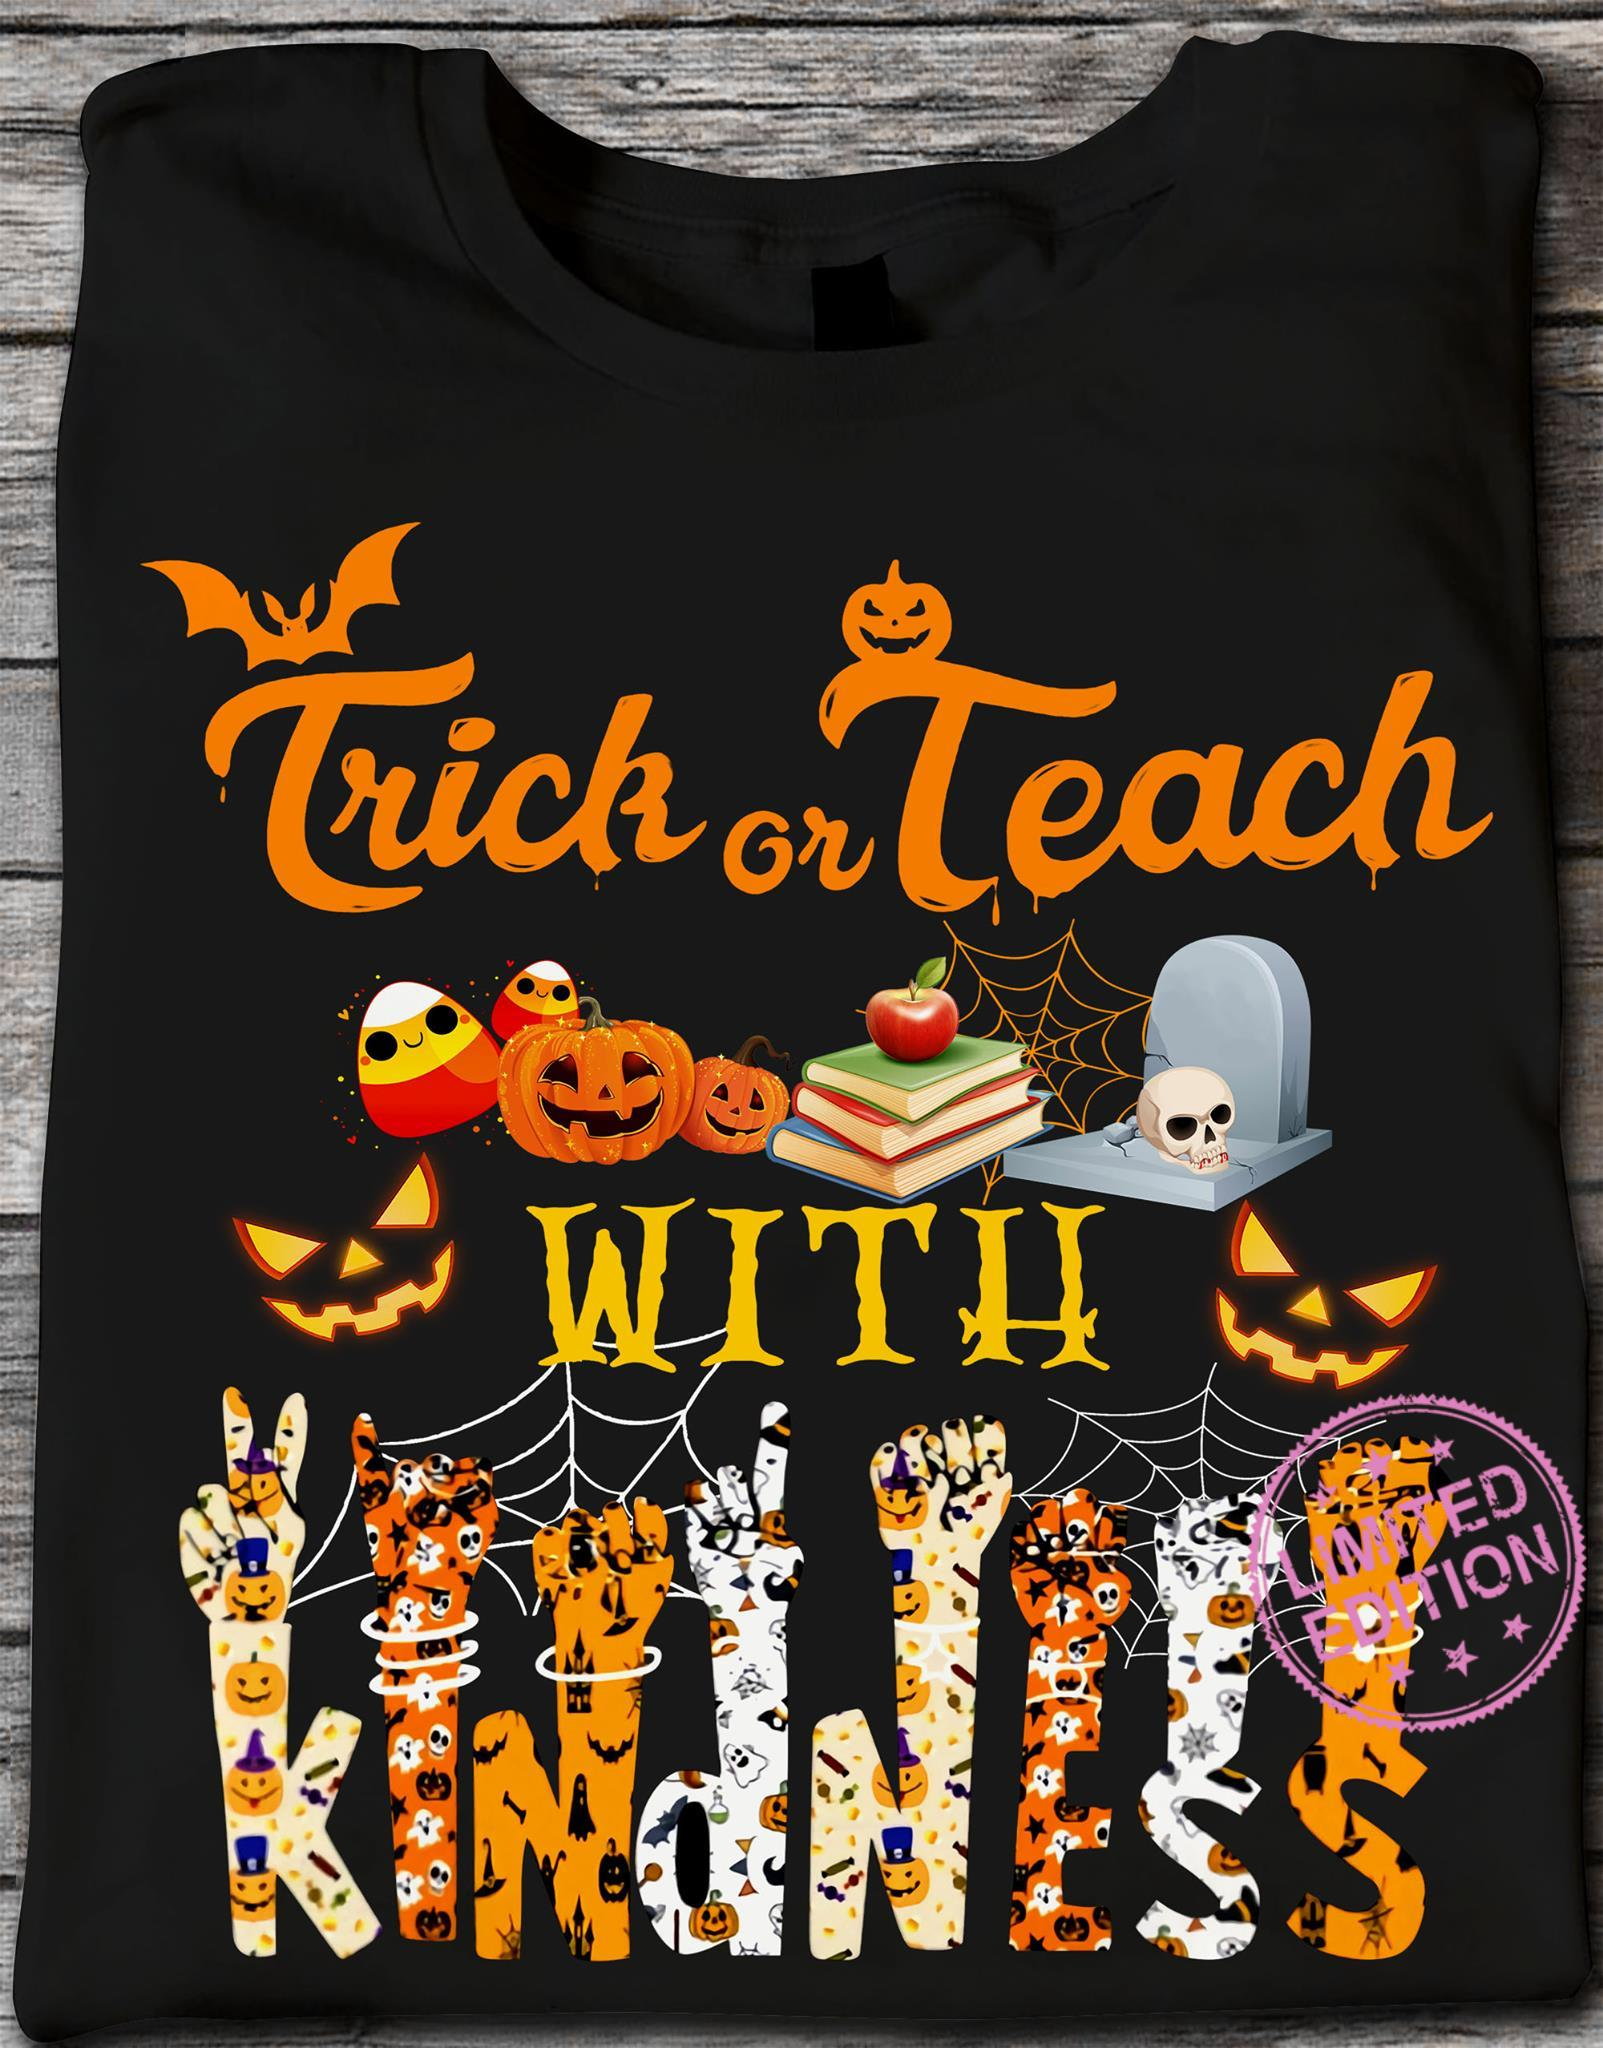 Trick or teach with kindness halloween shirt